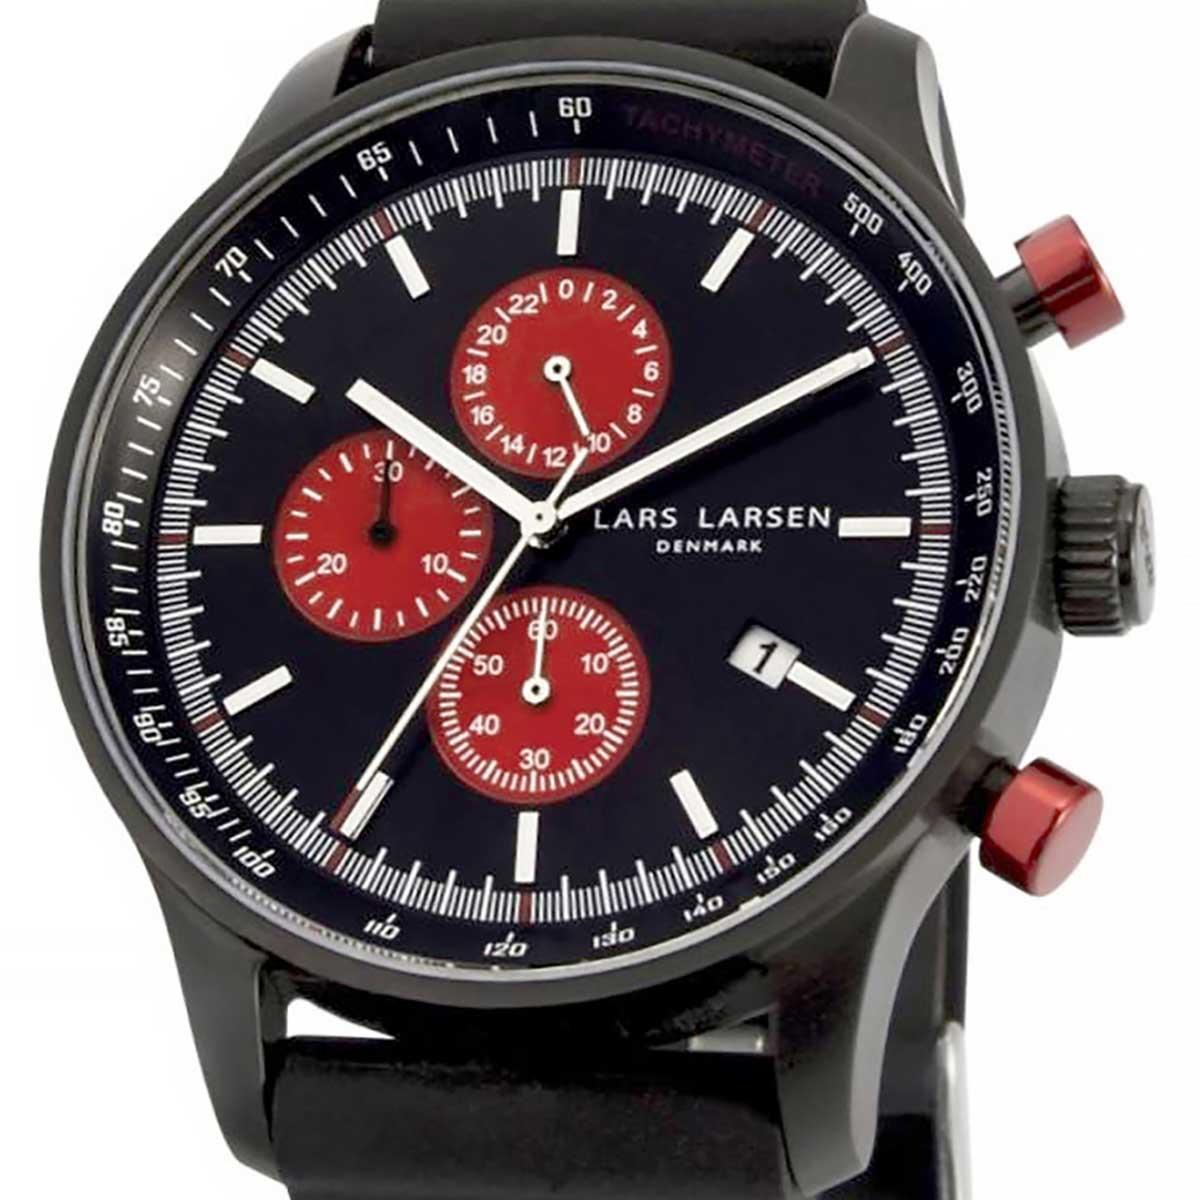 LARS LARSEN ラースラーセン (LLARSEN エルラーセン) 電池式クォーツ 腕時計 [133CBBS] 並行輸入品  クロノグラフ